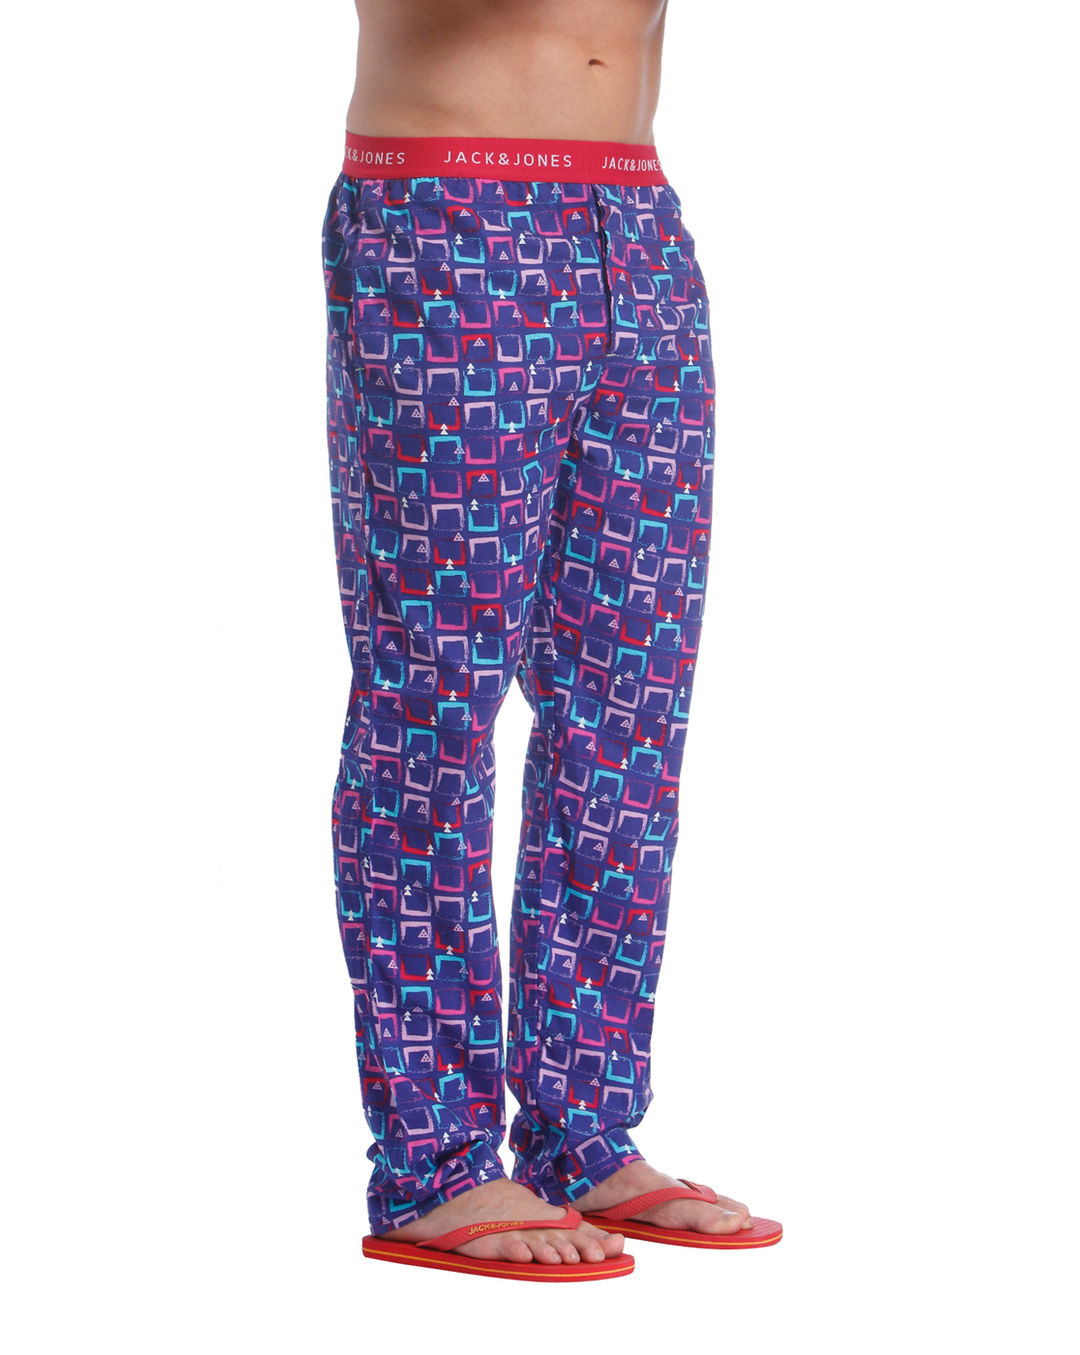 Kaufen Sie Authentic Neue Produkte wie kauft man Buy Jack & Jones Pyjama Online | Jack & Jones